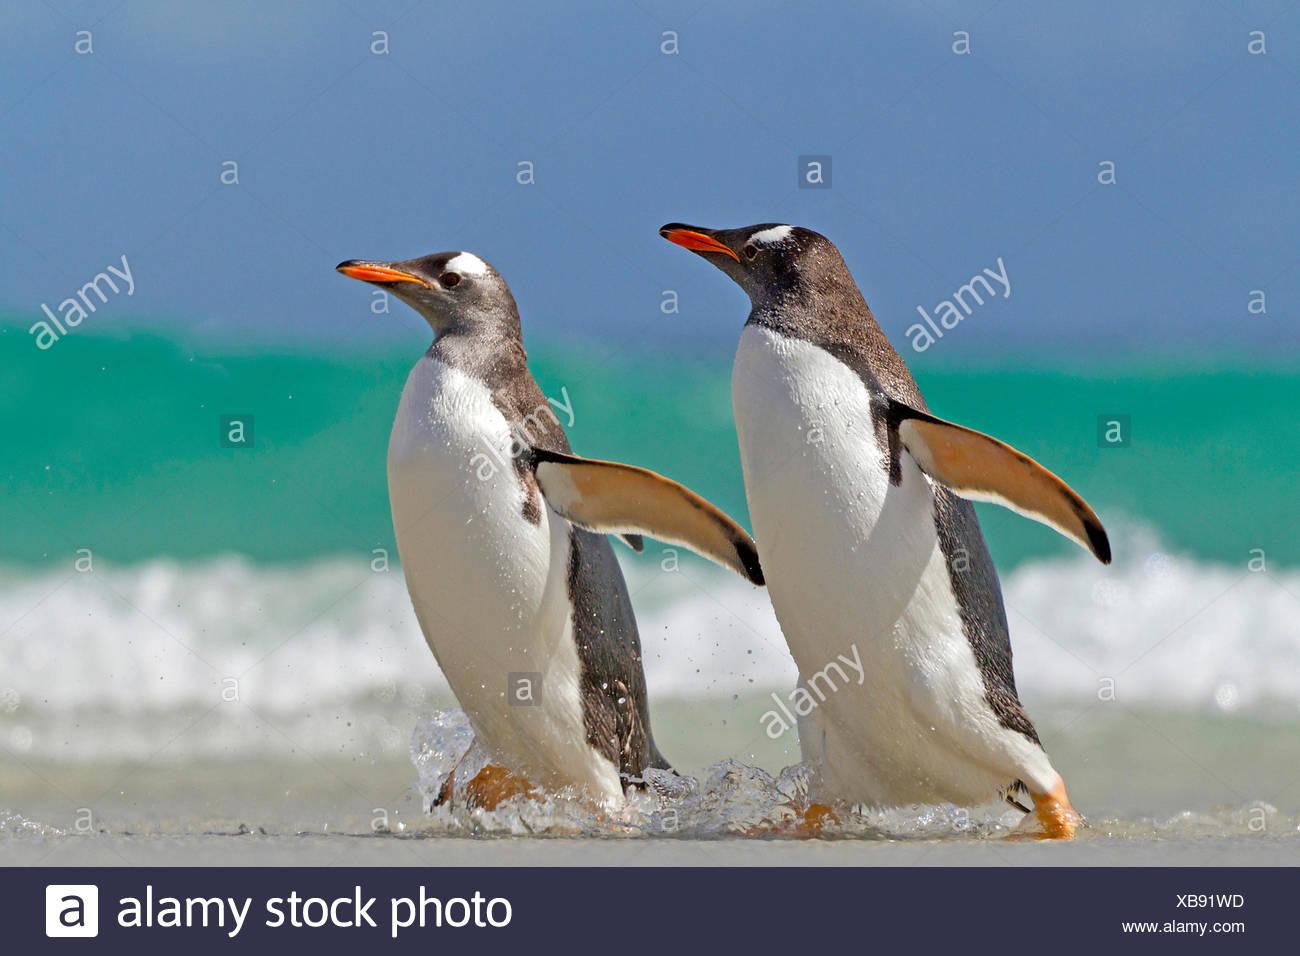 gentoo penguin (Pygoscelis papua), two penguins going on shore, Antarctica, Falkland Islands - Stock Image